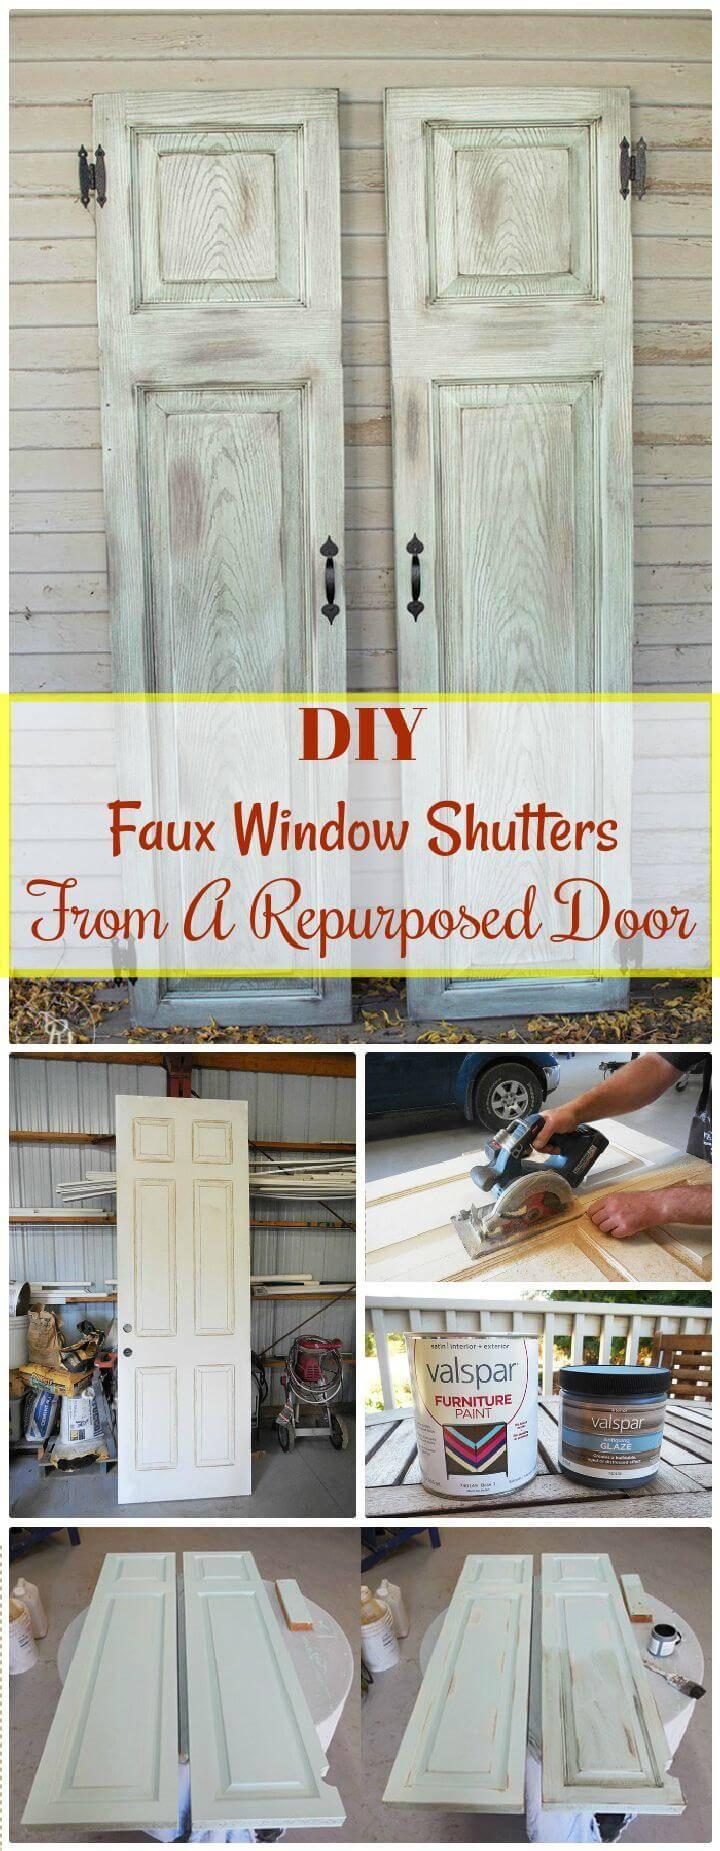 DIY Faux Window Shutters From A Repurposed Door